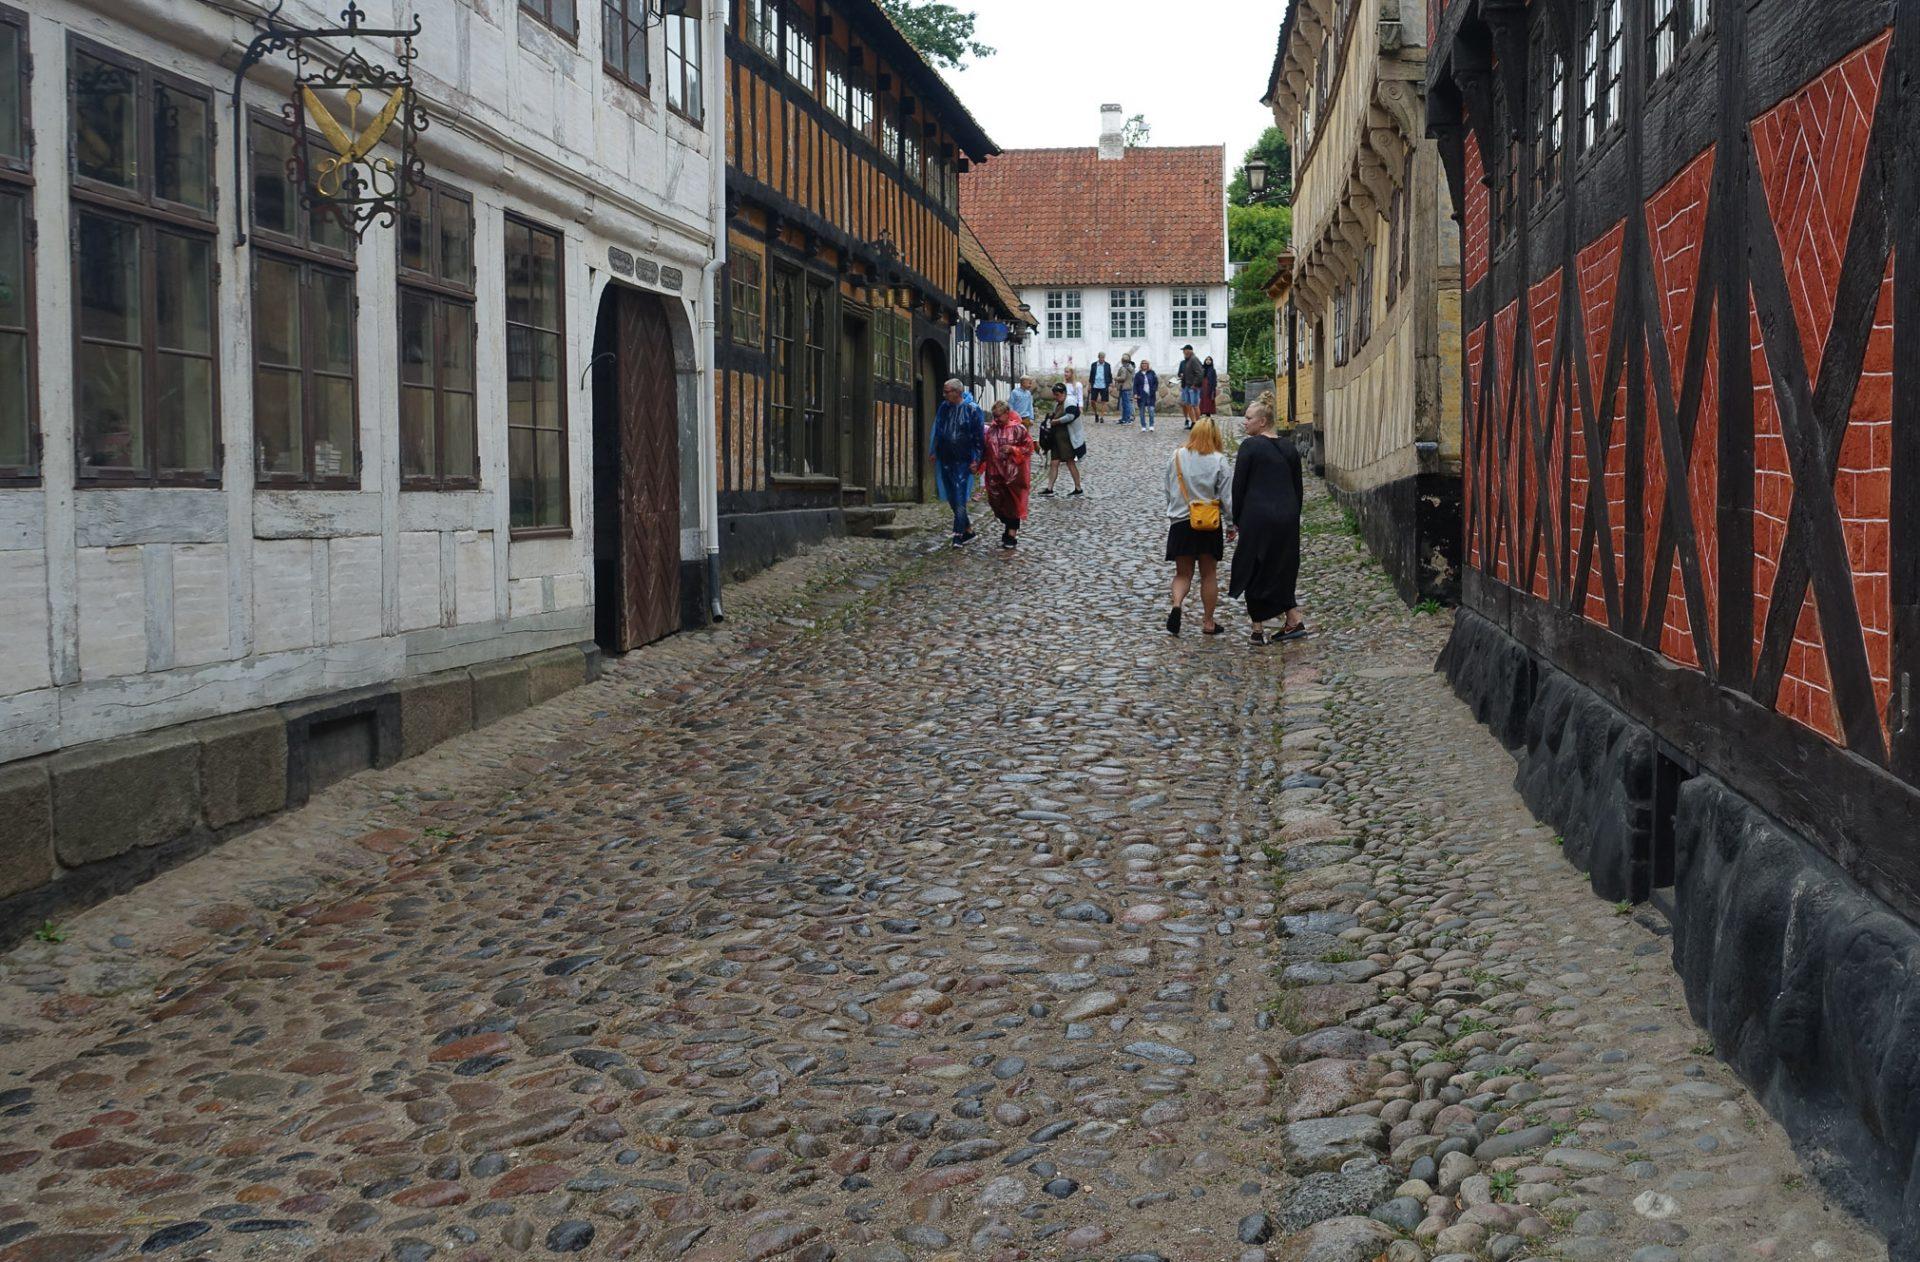 Reportage: Sommerferieidyl i Den Gamle By i Aarhus